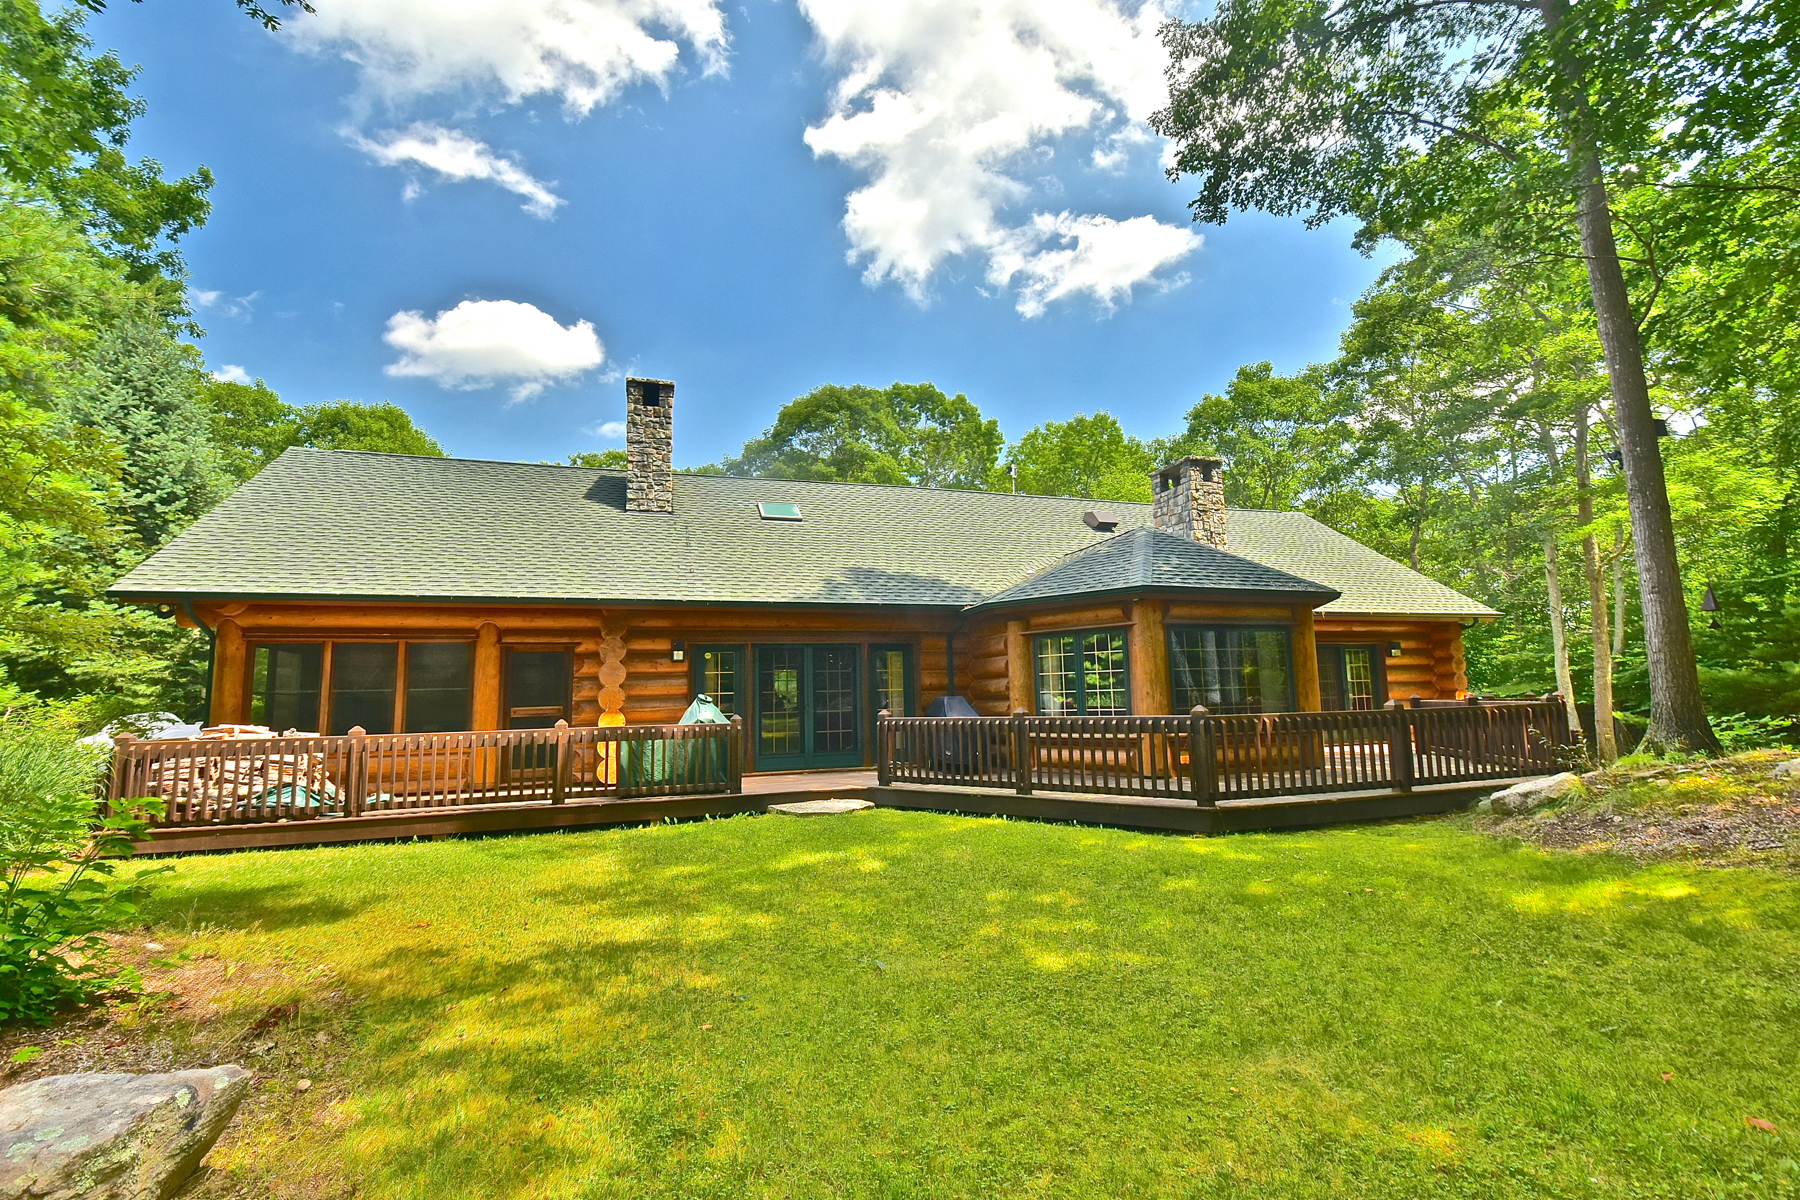 独户住宅 为 销售 在 Custom Built Estate Home 381 New London Tpke Stonington, 康涅狄格州 06378 美国